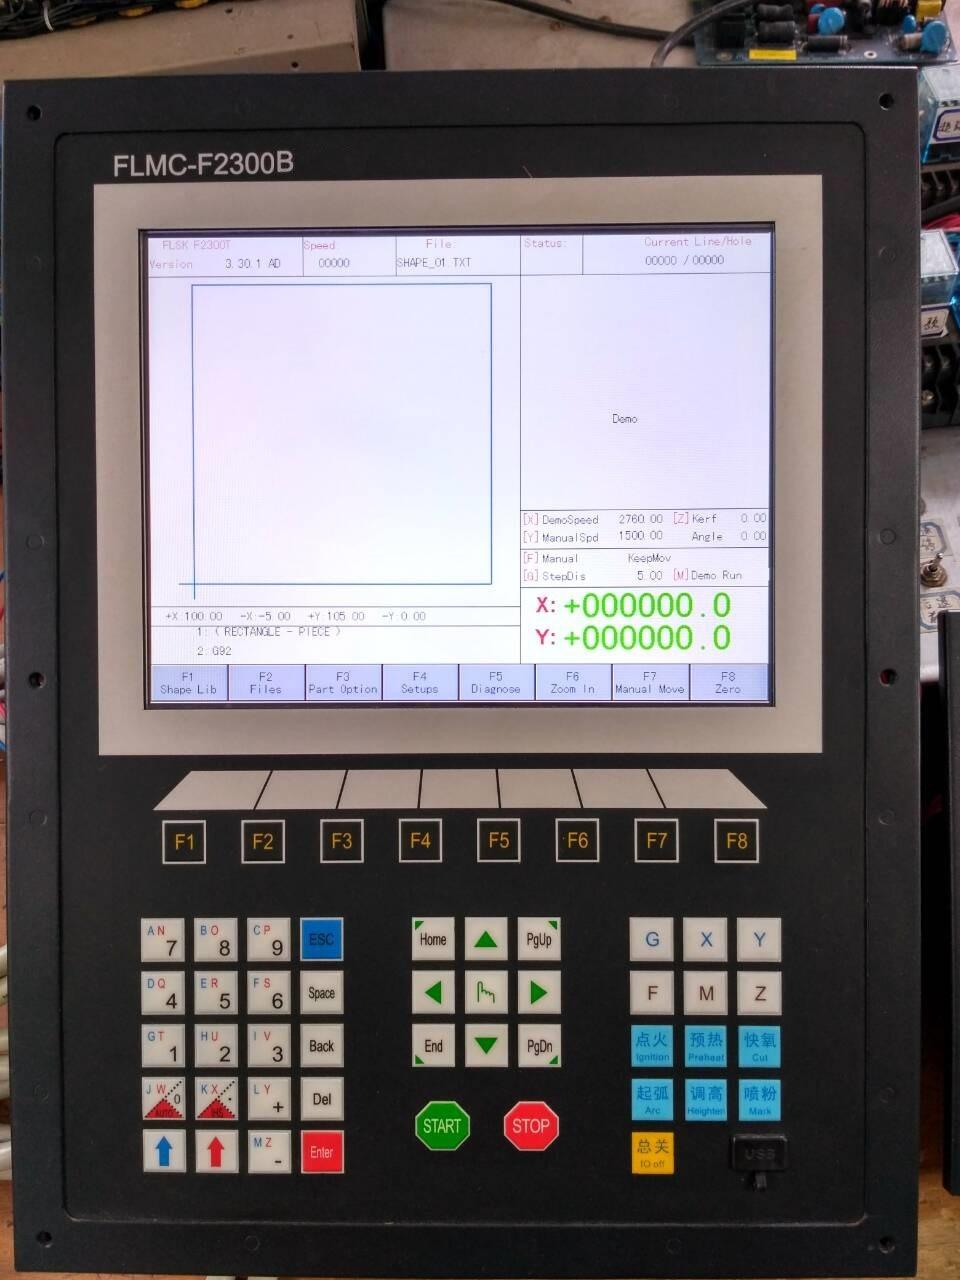 Hot Sell CNC Controller Flame Plasma Cutting Machine CNC Controller Stepper Motor Servo Motor Controller 10.4'' Screen F2300B цена